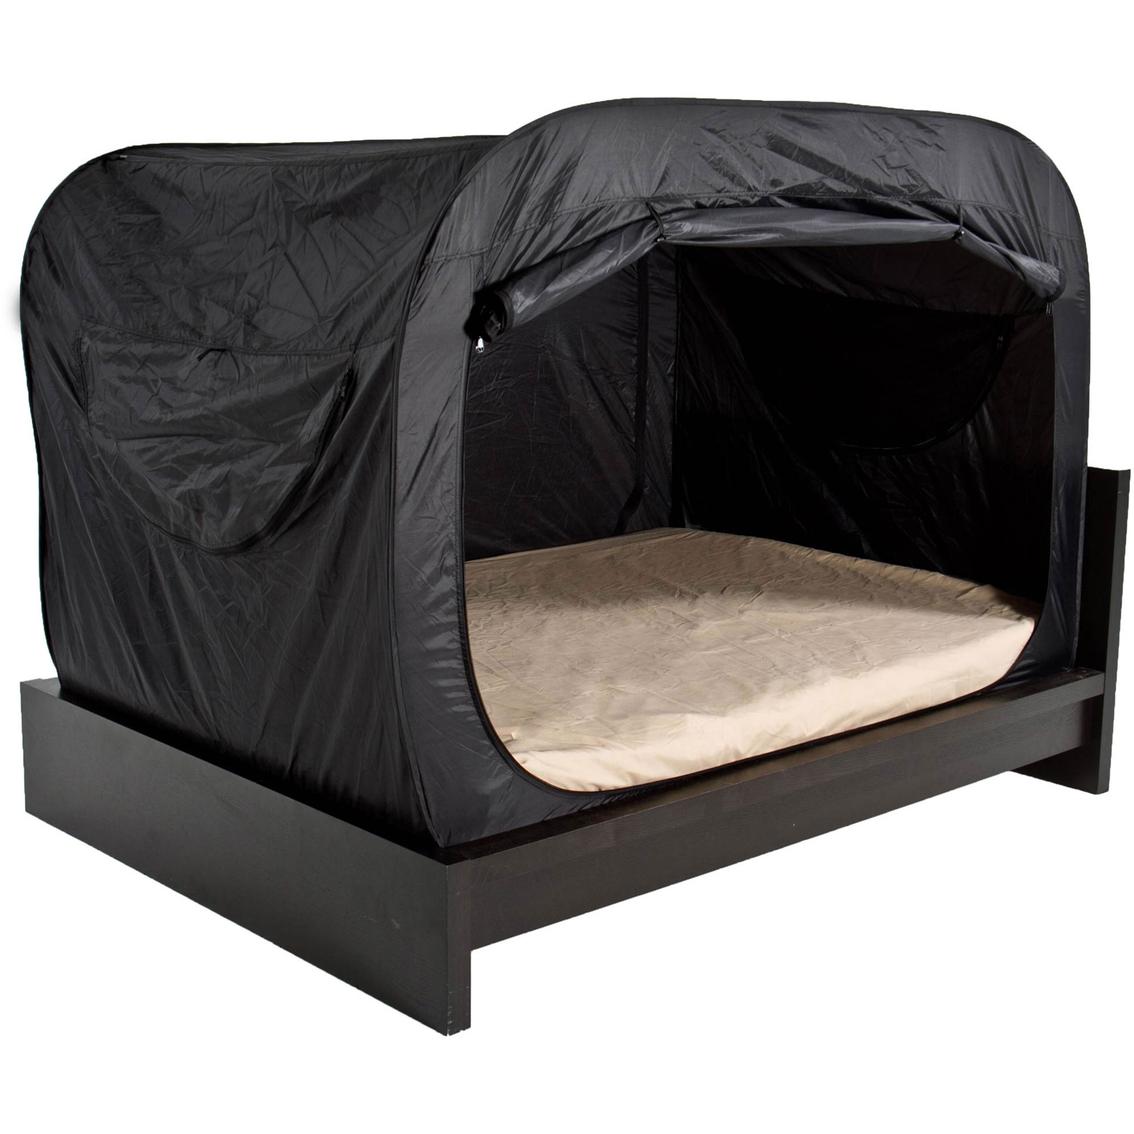 privacy pop bed tent beds home appliances shop the exchange. Black Bedroom Furniture Sets. Home Design Ideas